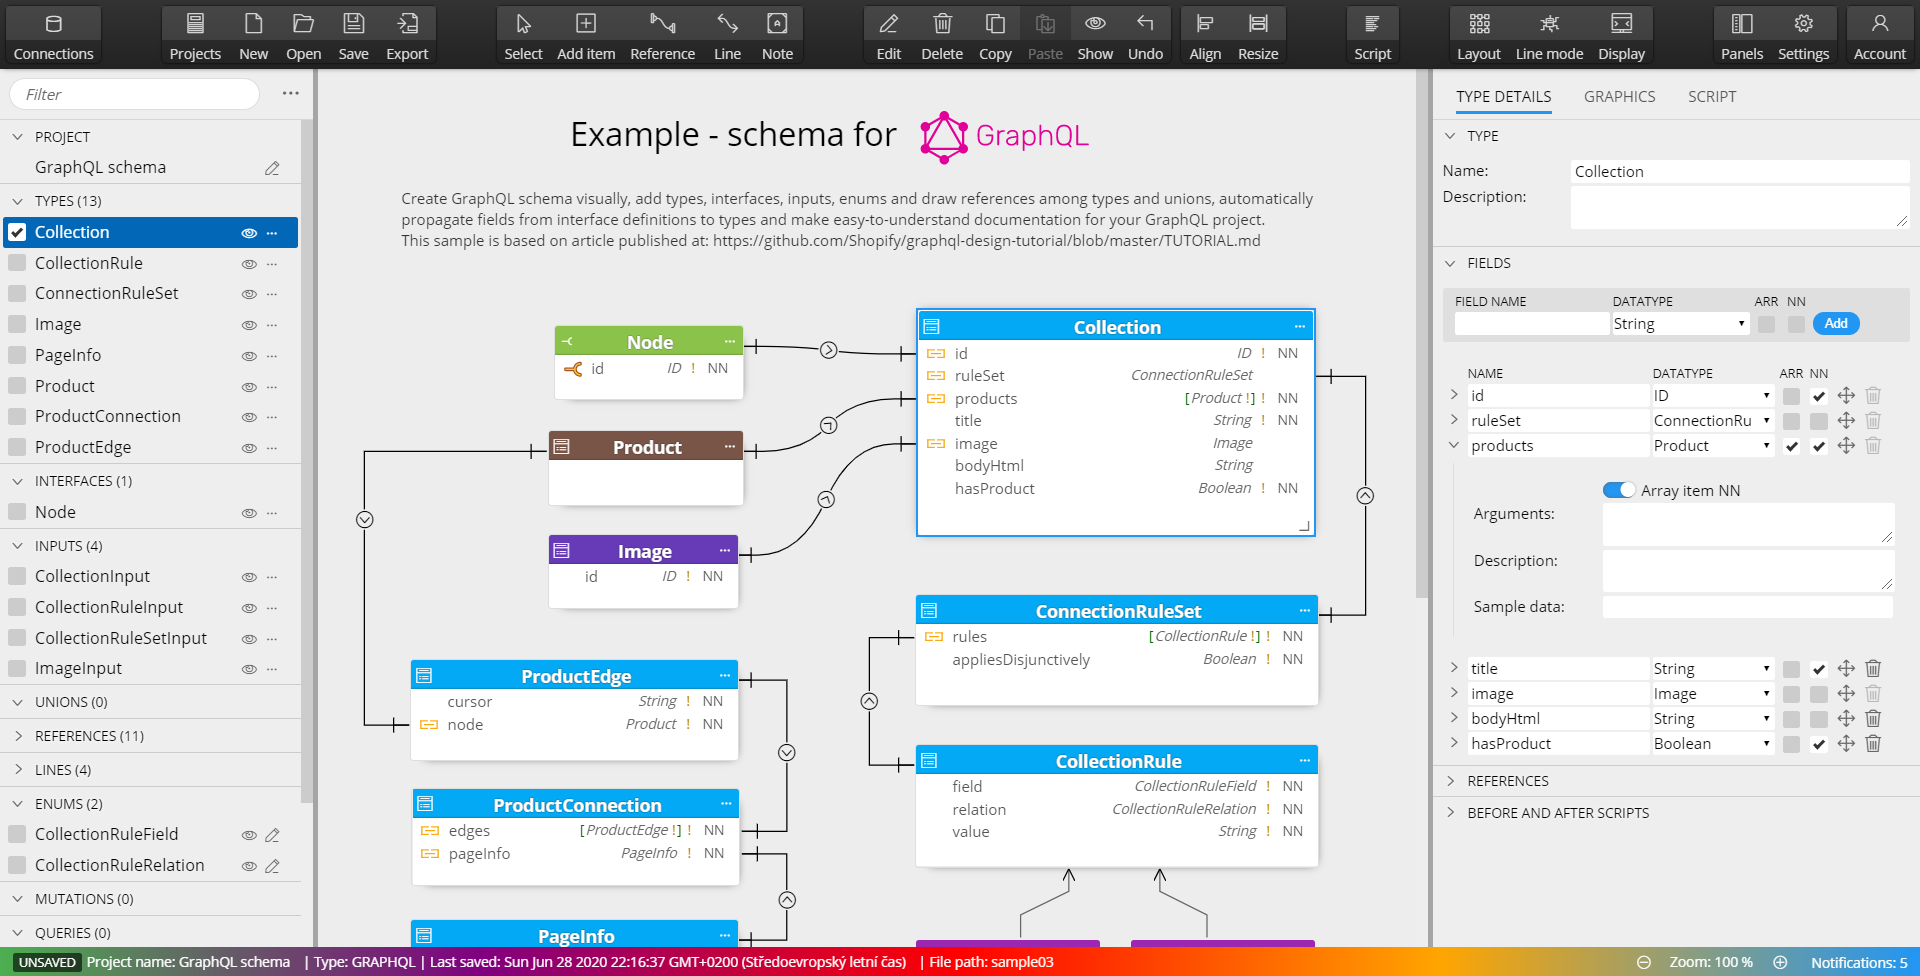 graphql schema design - modeling tool